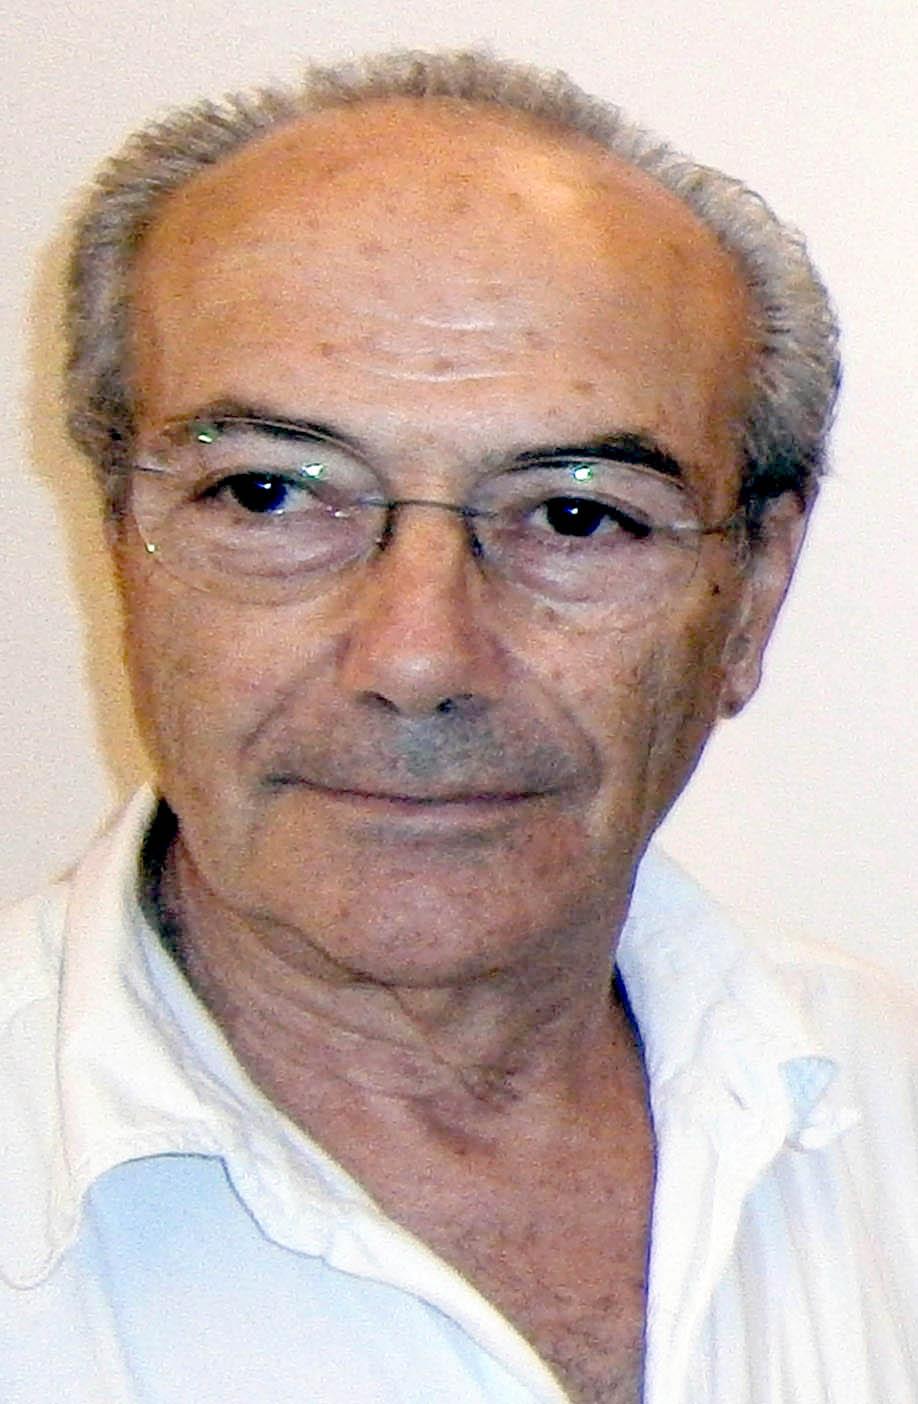 Antonio Signorella, medico-pediatra, poeta e pittore